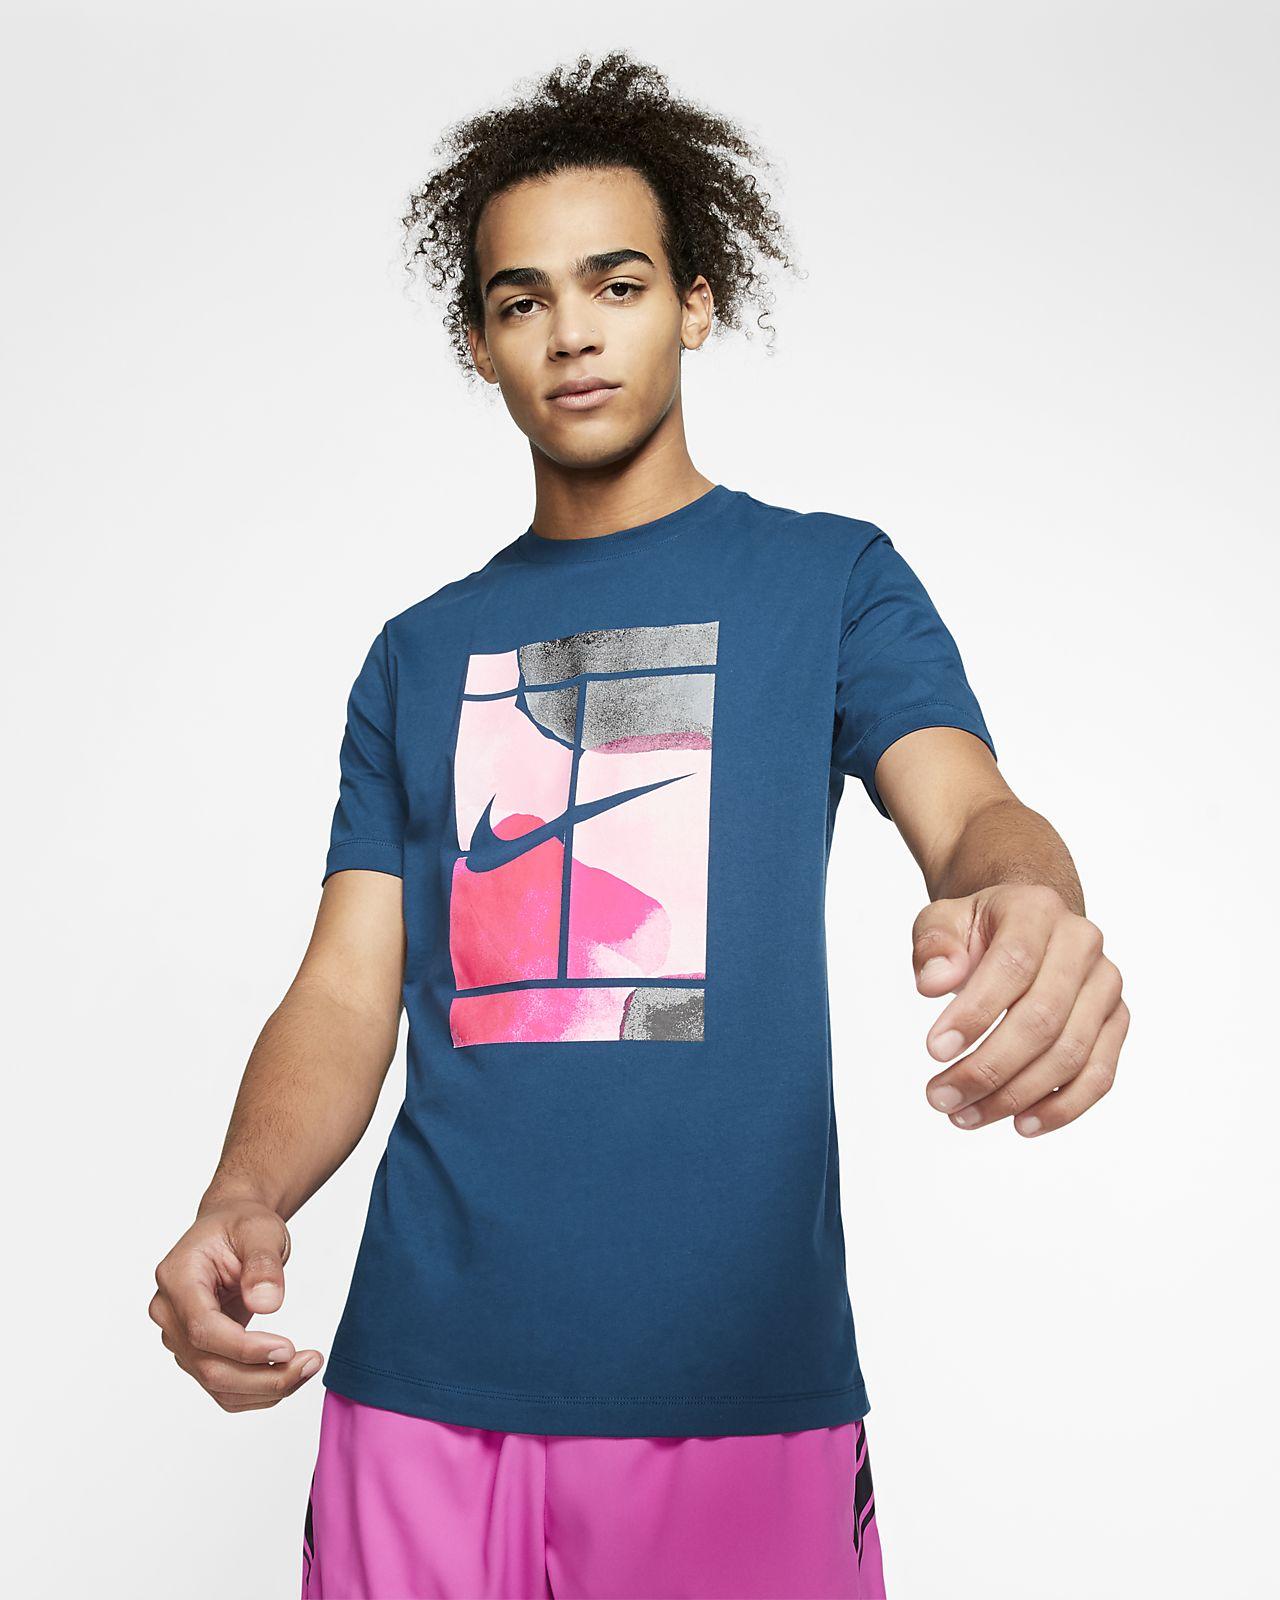 NIKE NADAL MELBOURNE SHORTS NIKE Men's Clothing